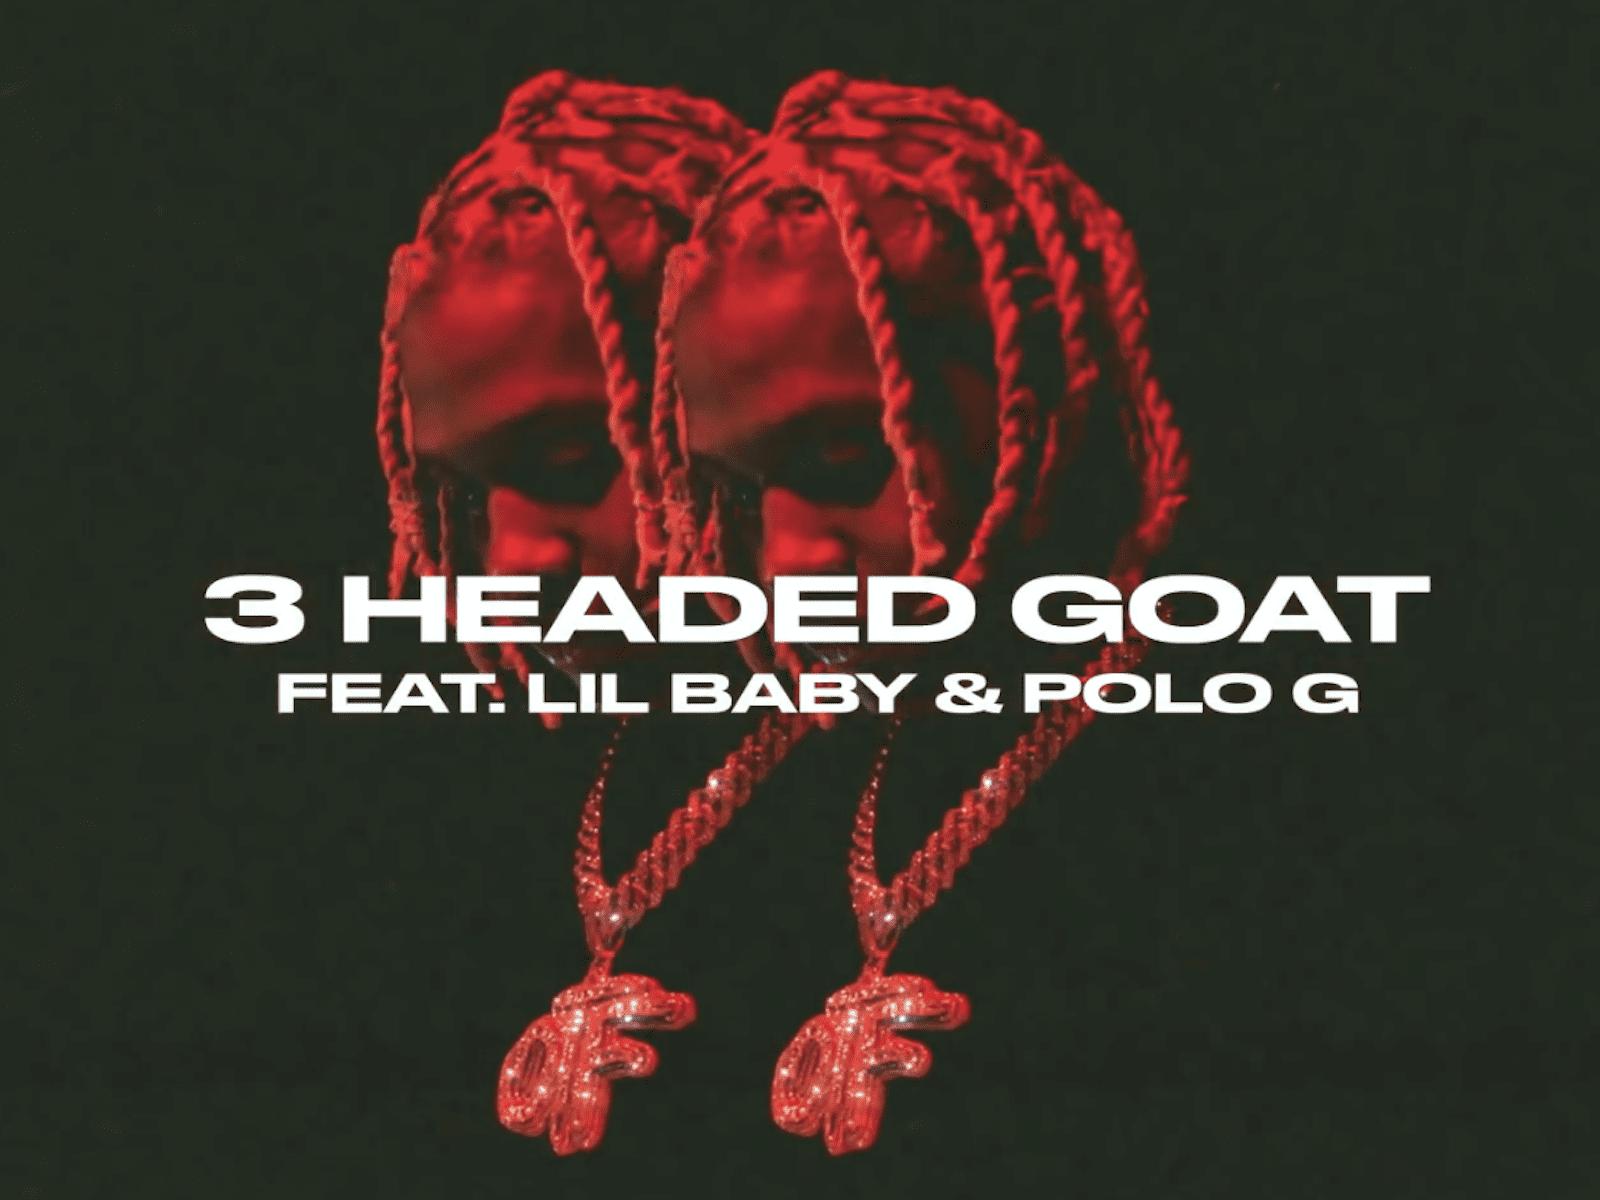 Lil Durk 3 Headed Goat Artwork